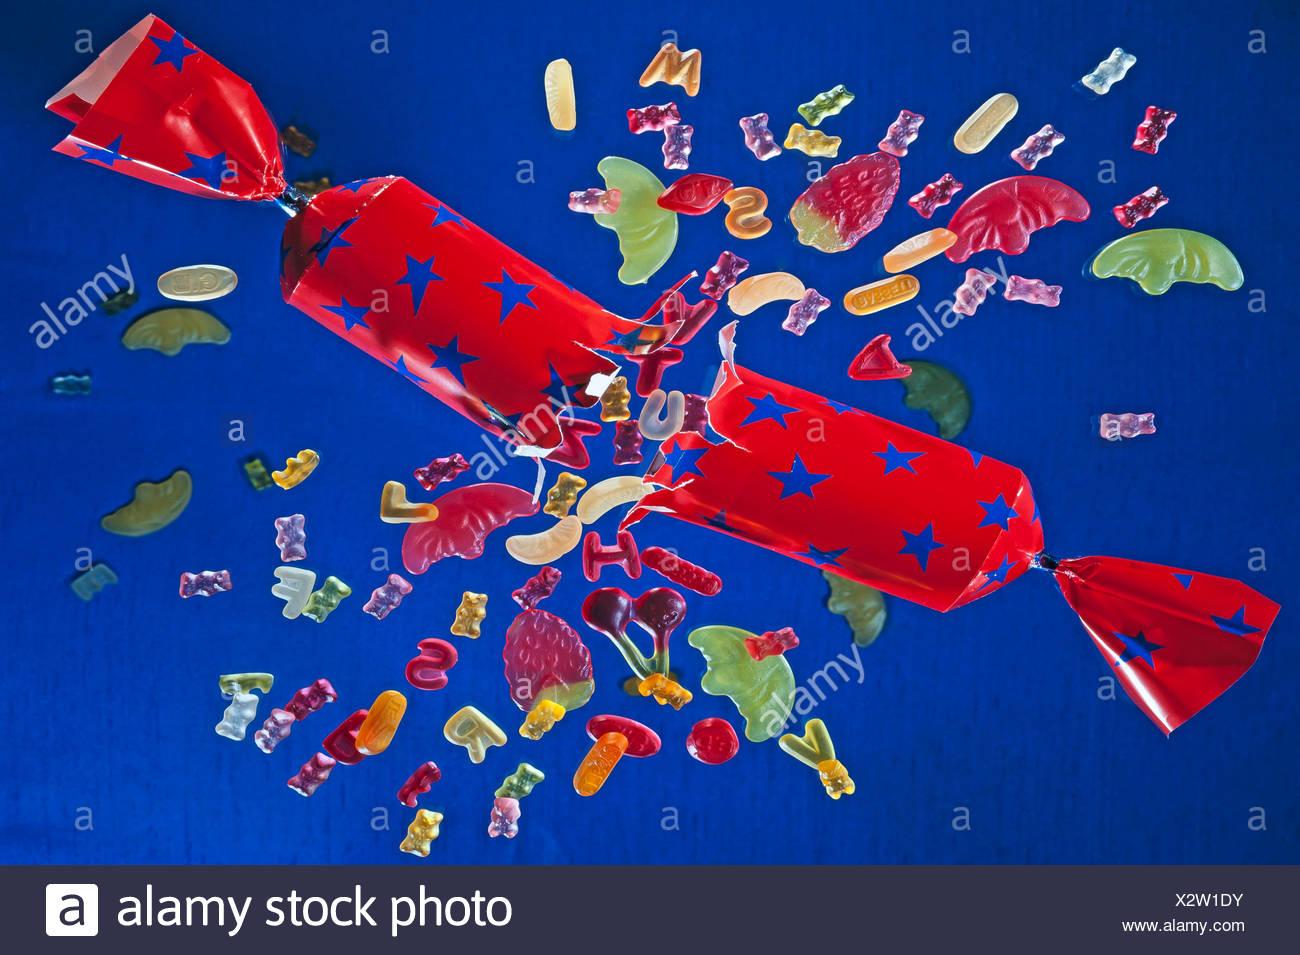 Bursting cracker with fruit gums - Stock Image